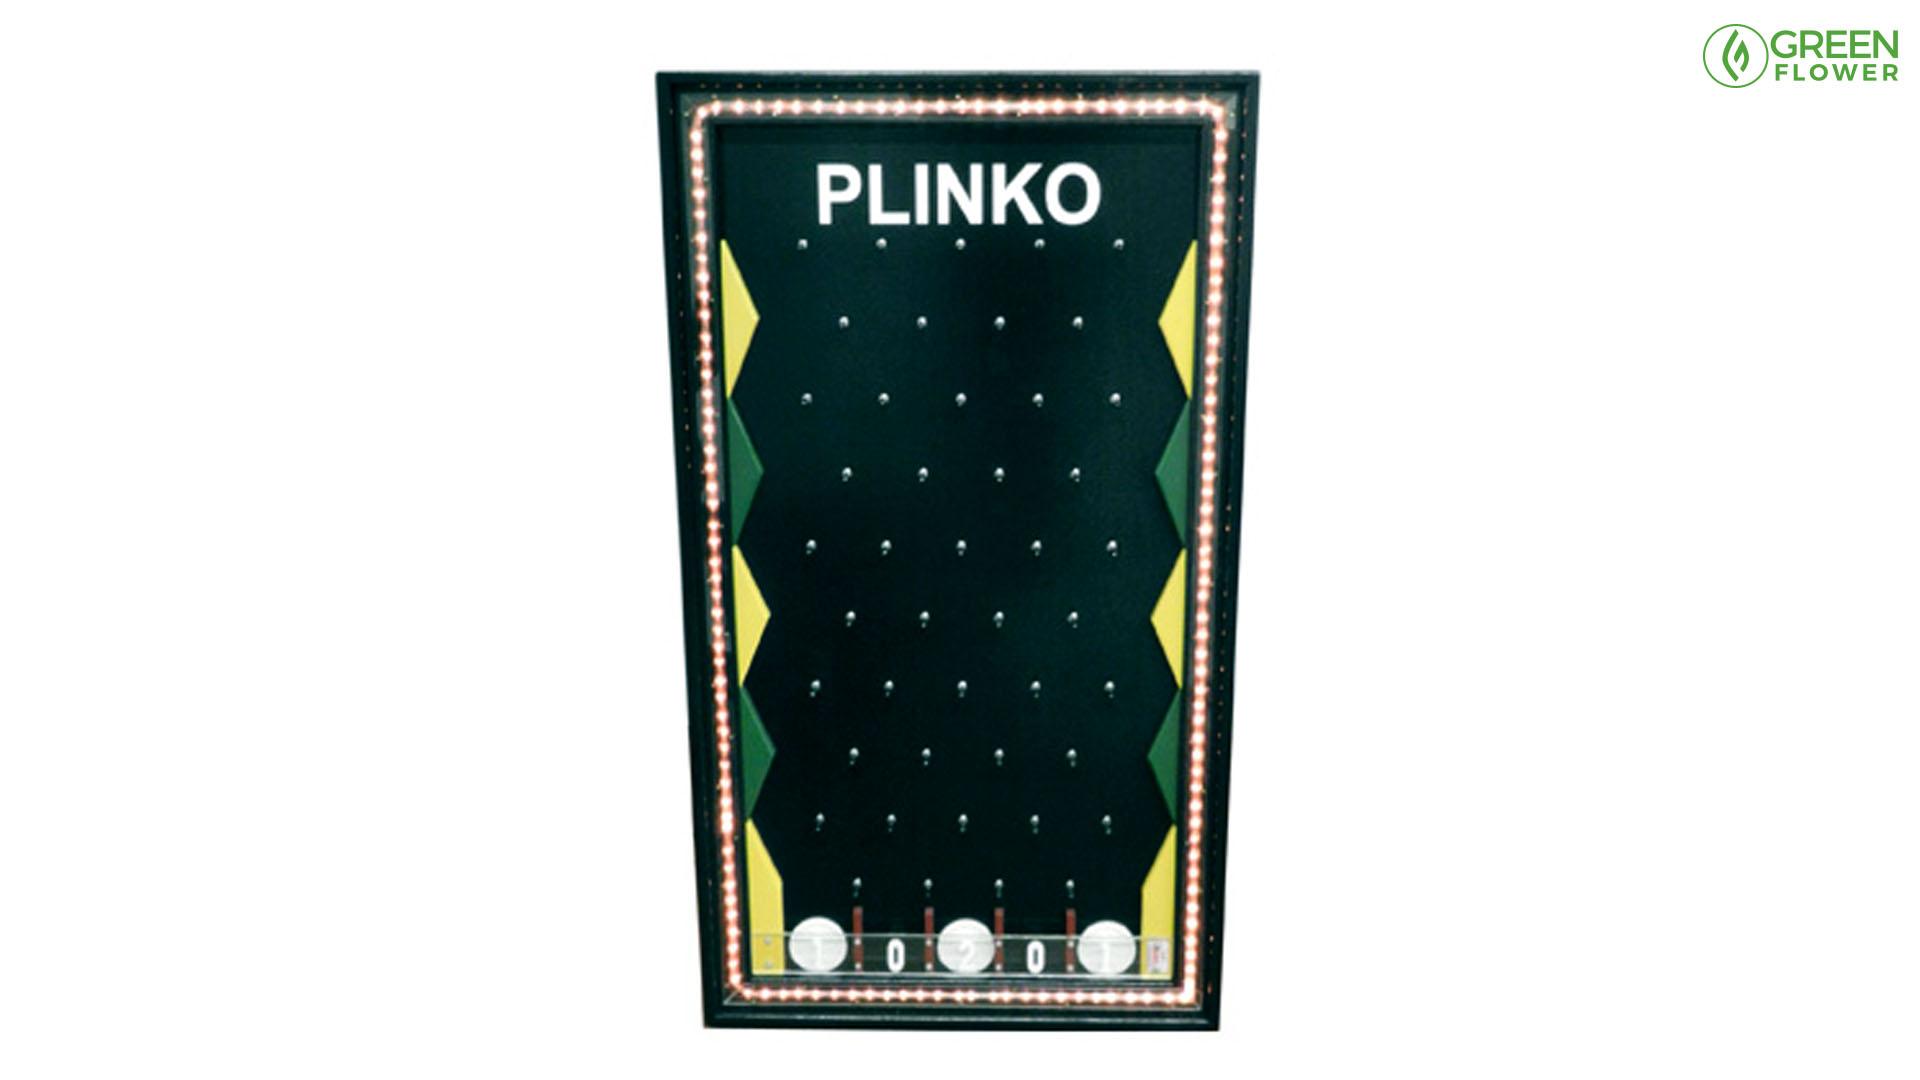 plinko game table with lights